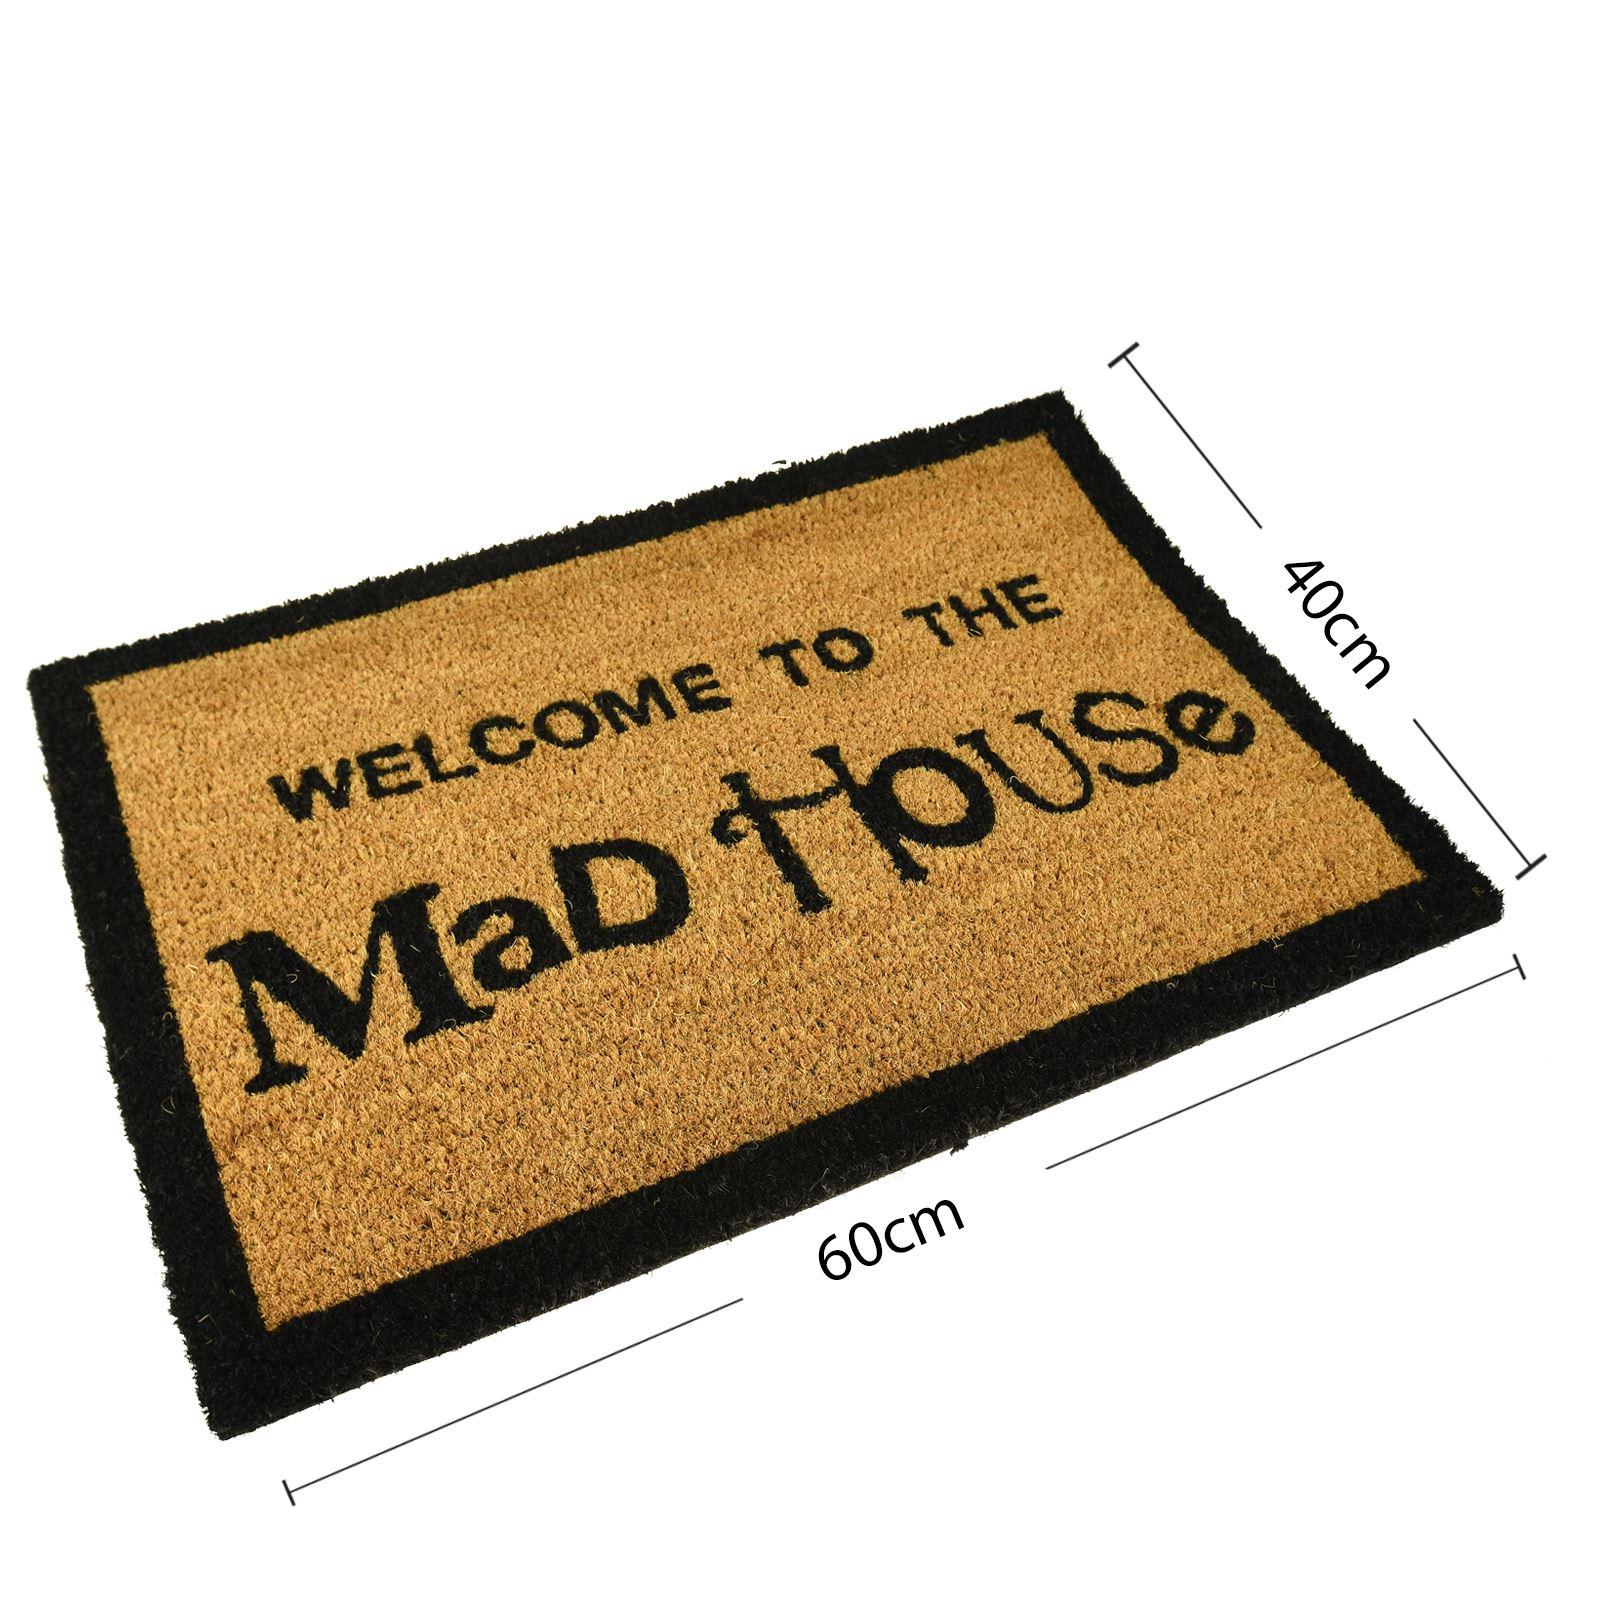 Plain-Non-Slip-Door-Mat-Tough-Natural-Coir-PVC-Back-Welcome-Doormat-40-x-60cm miniatura 86